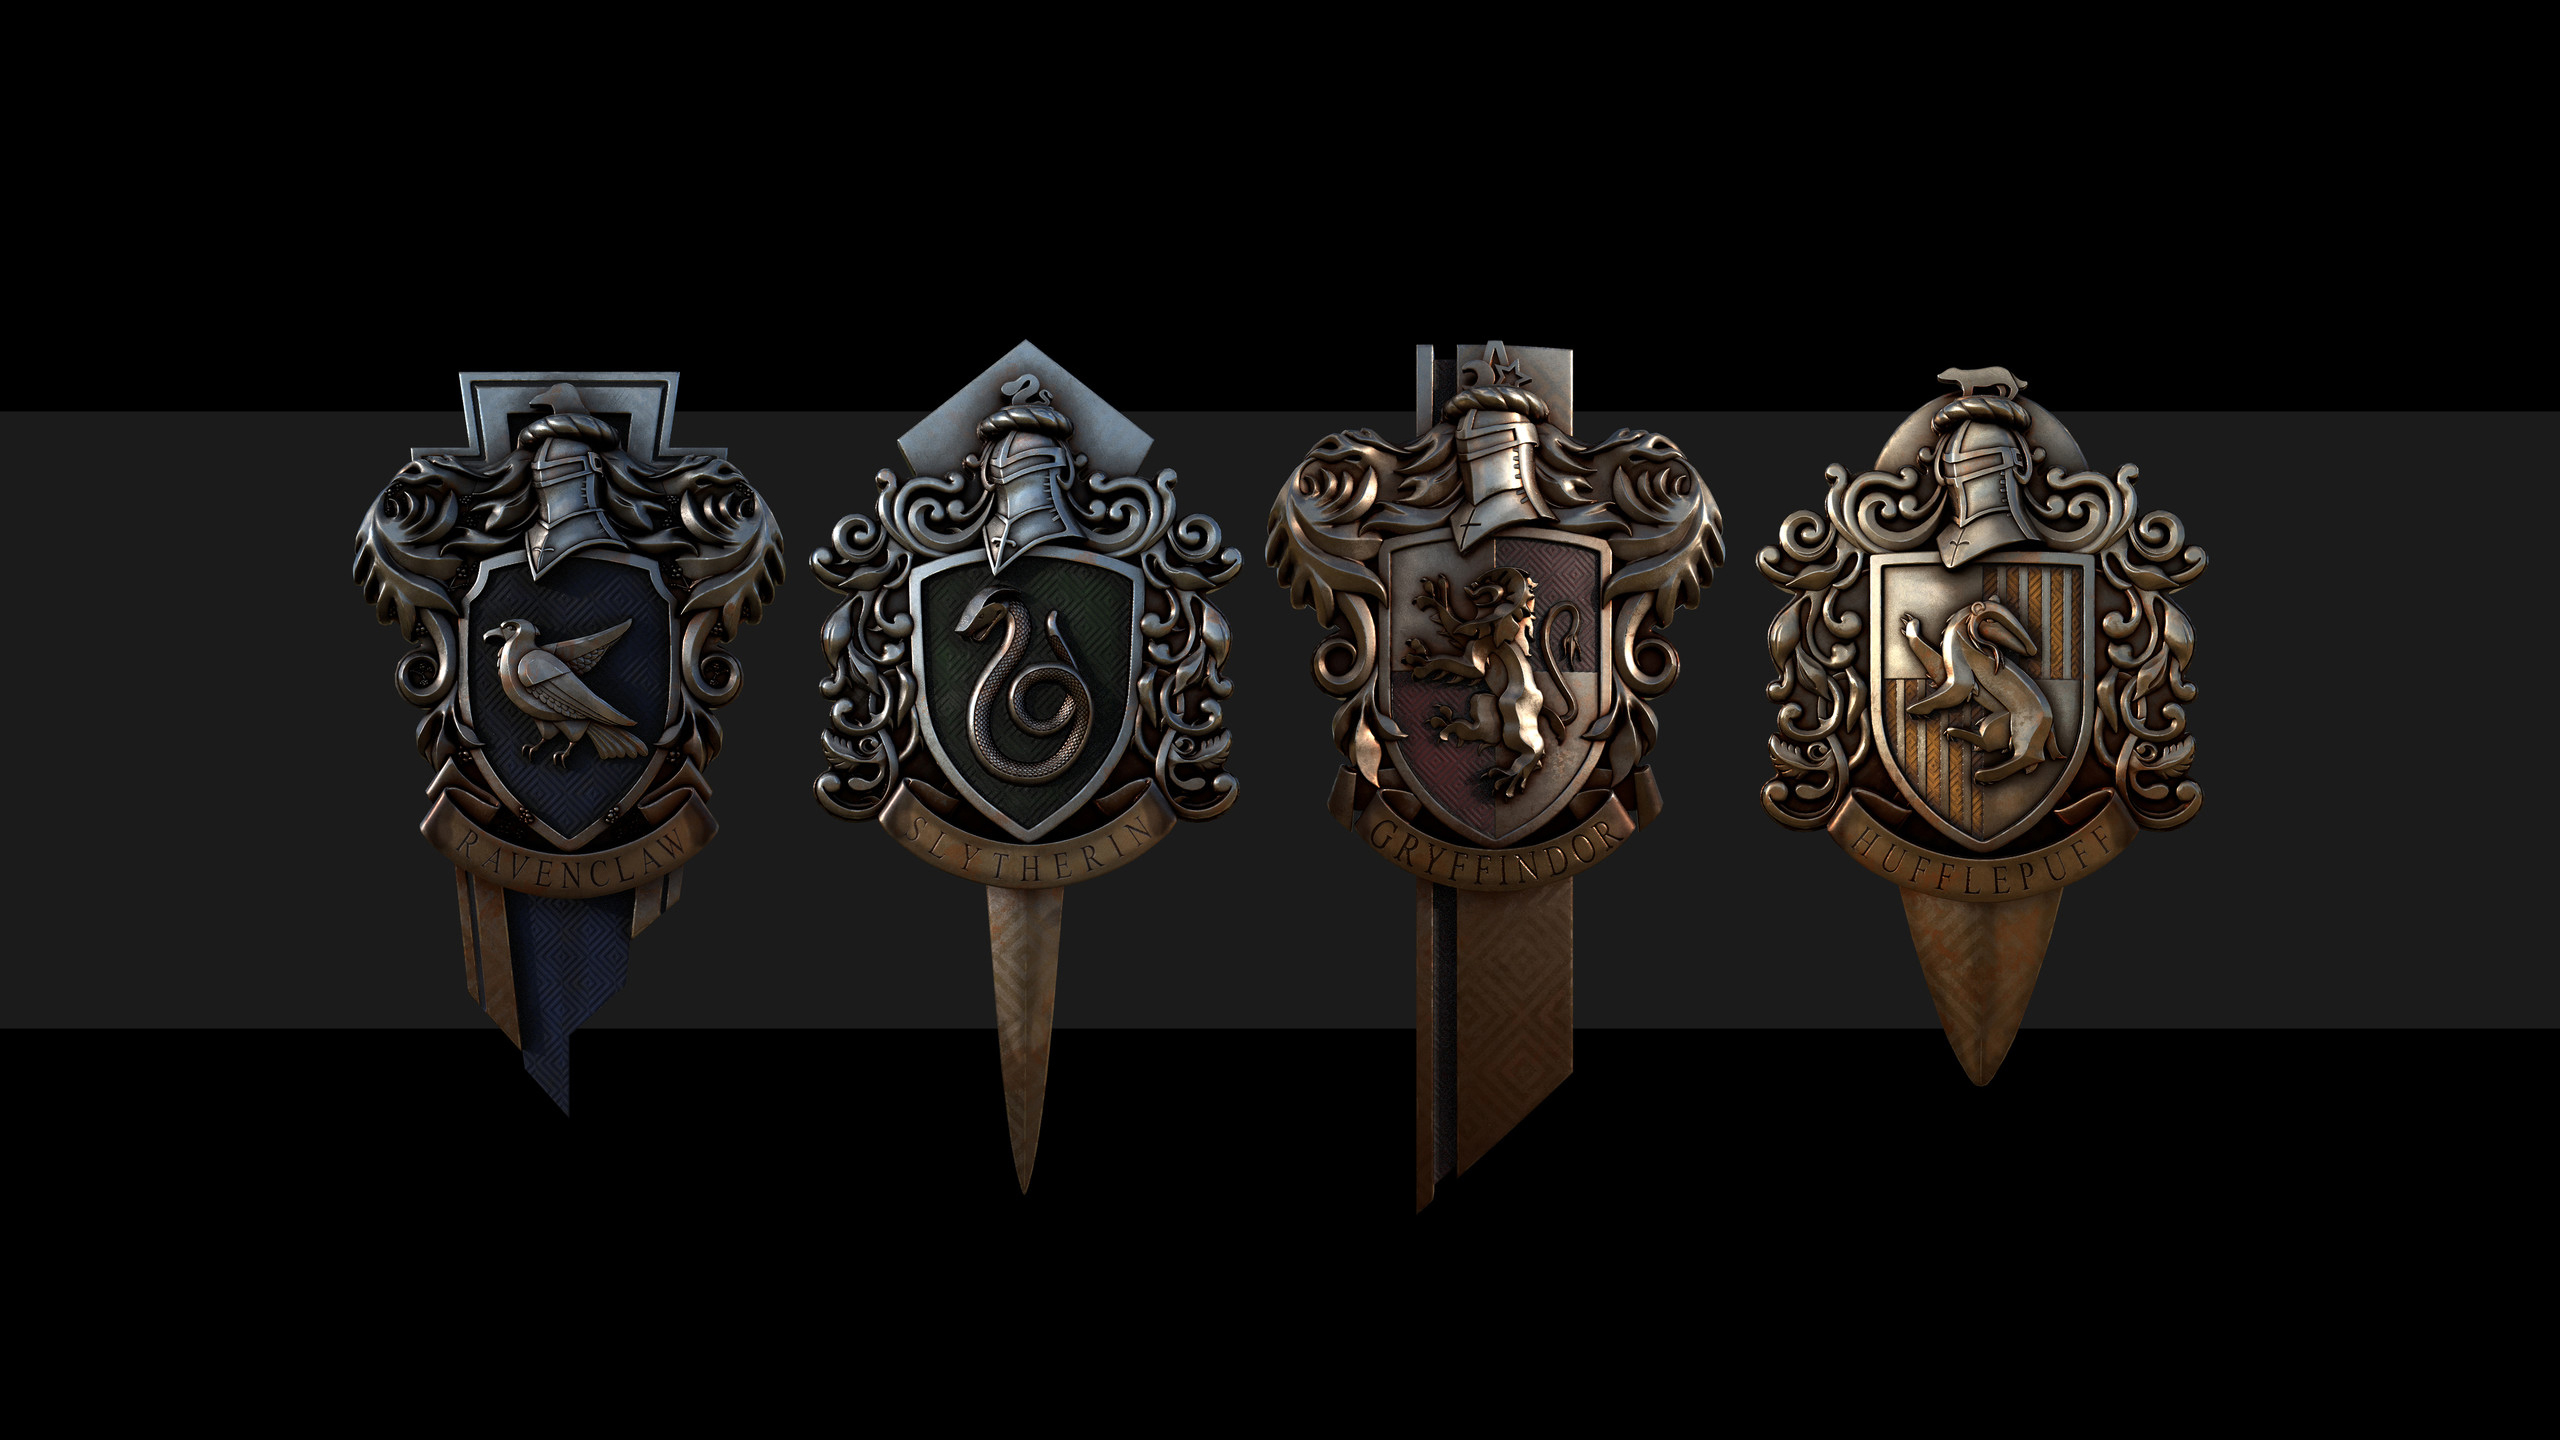 Wallpaper Harry Potter Badges